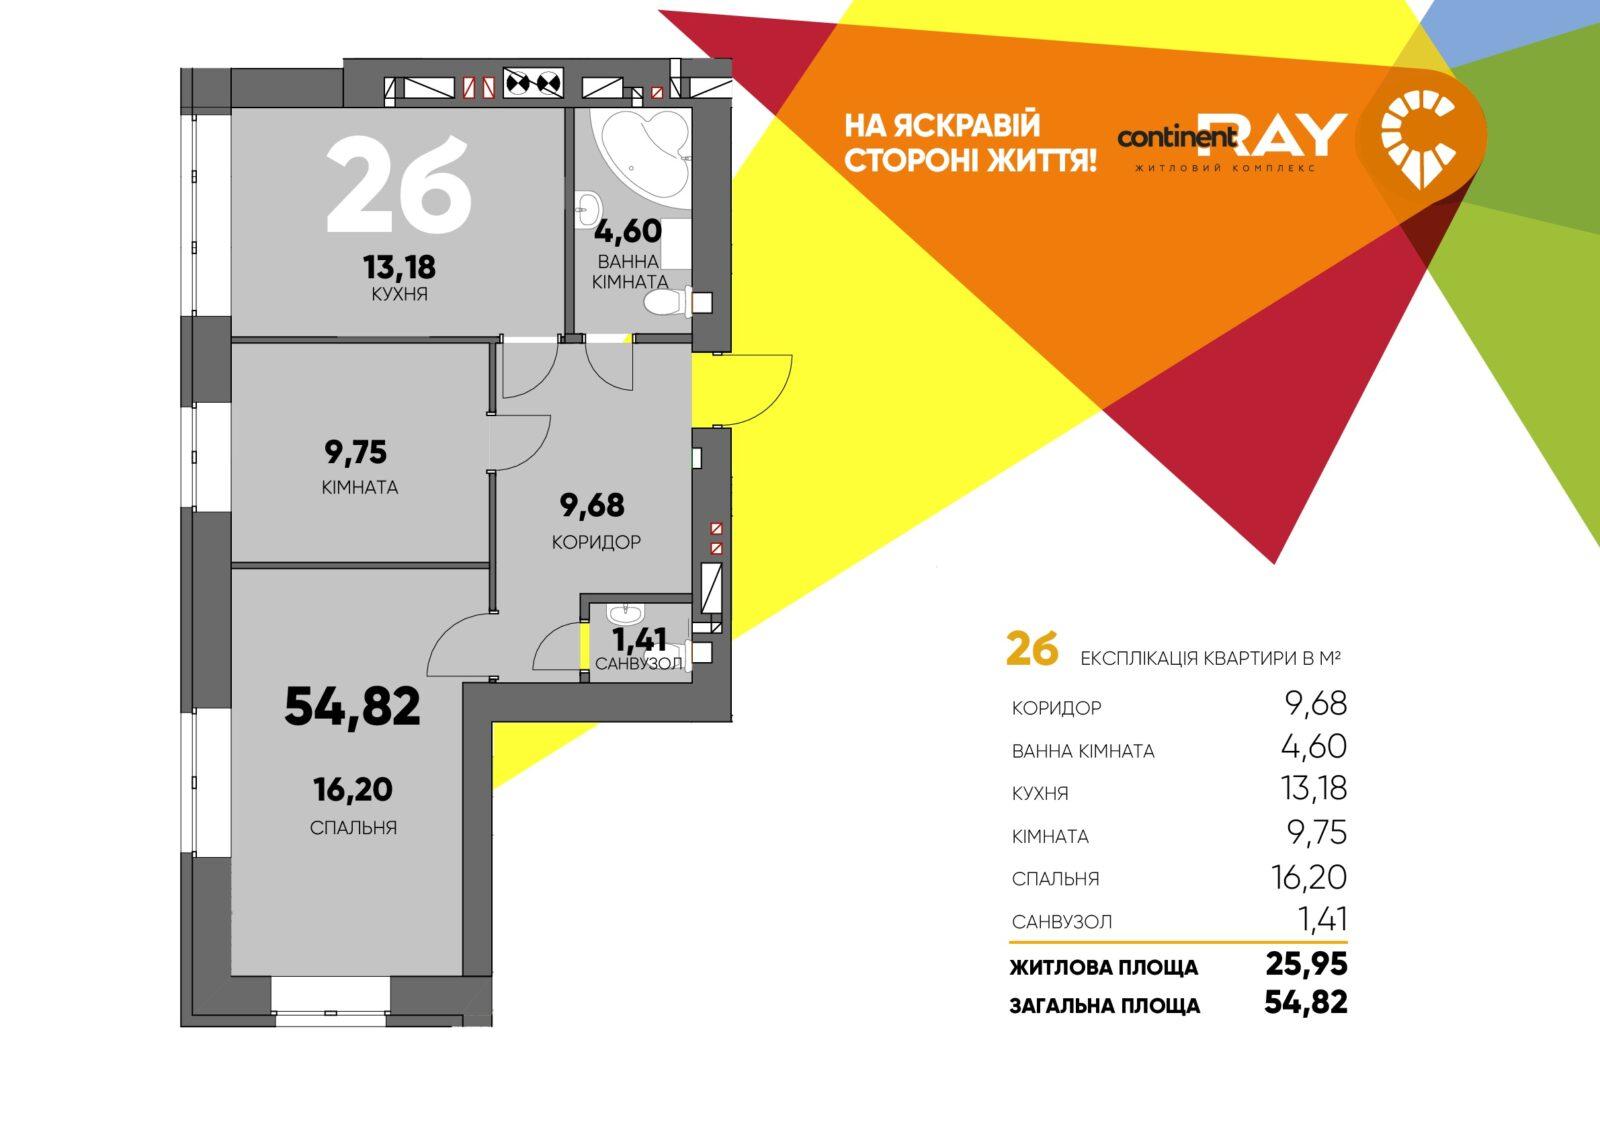 2-кімн. кв 2б 54.82 м²